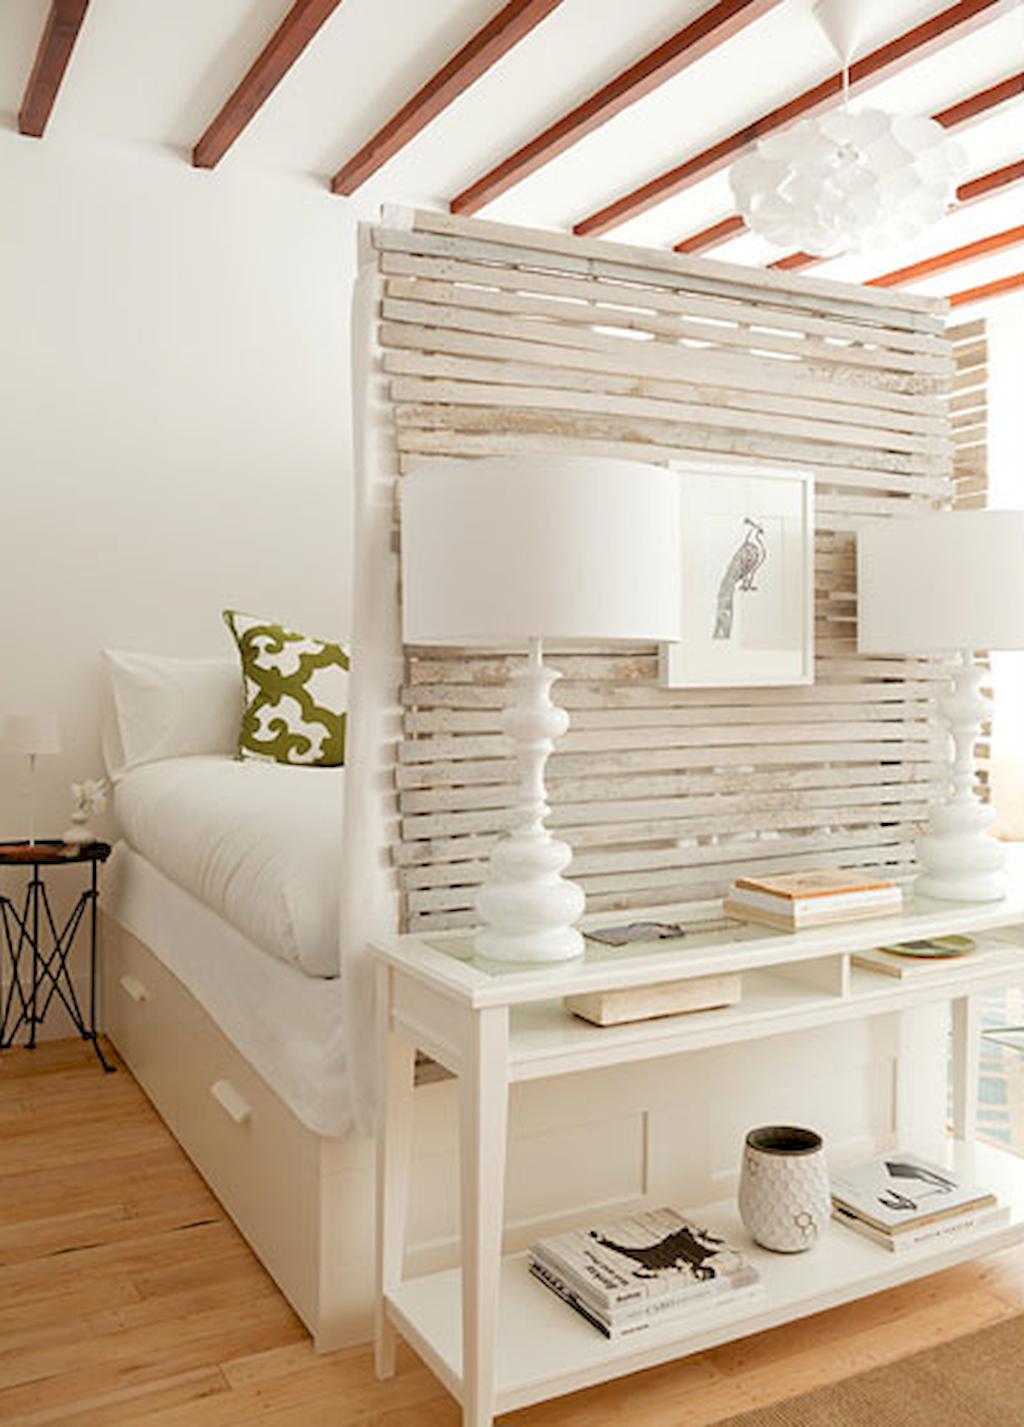 65 Clever Studio Apartment Decorating ideas images